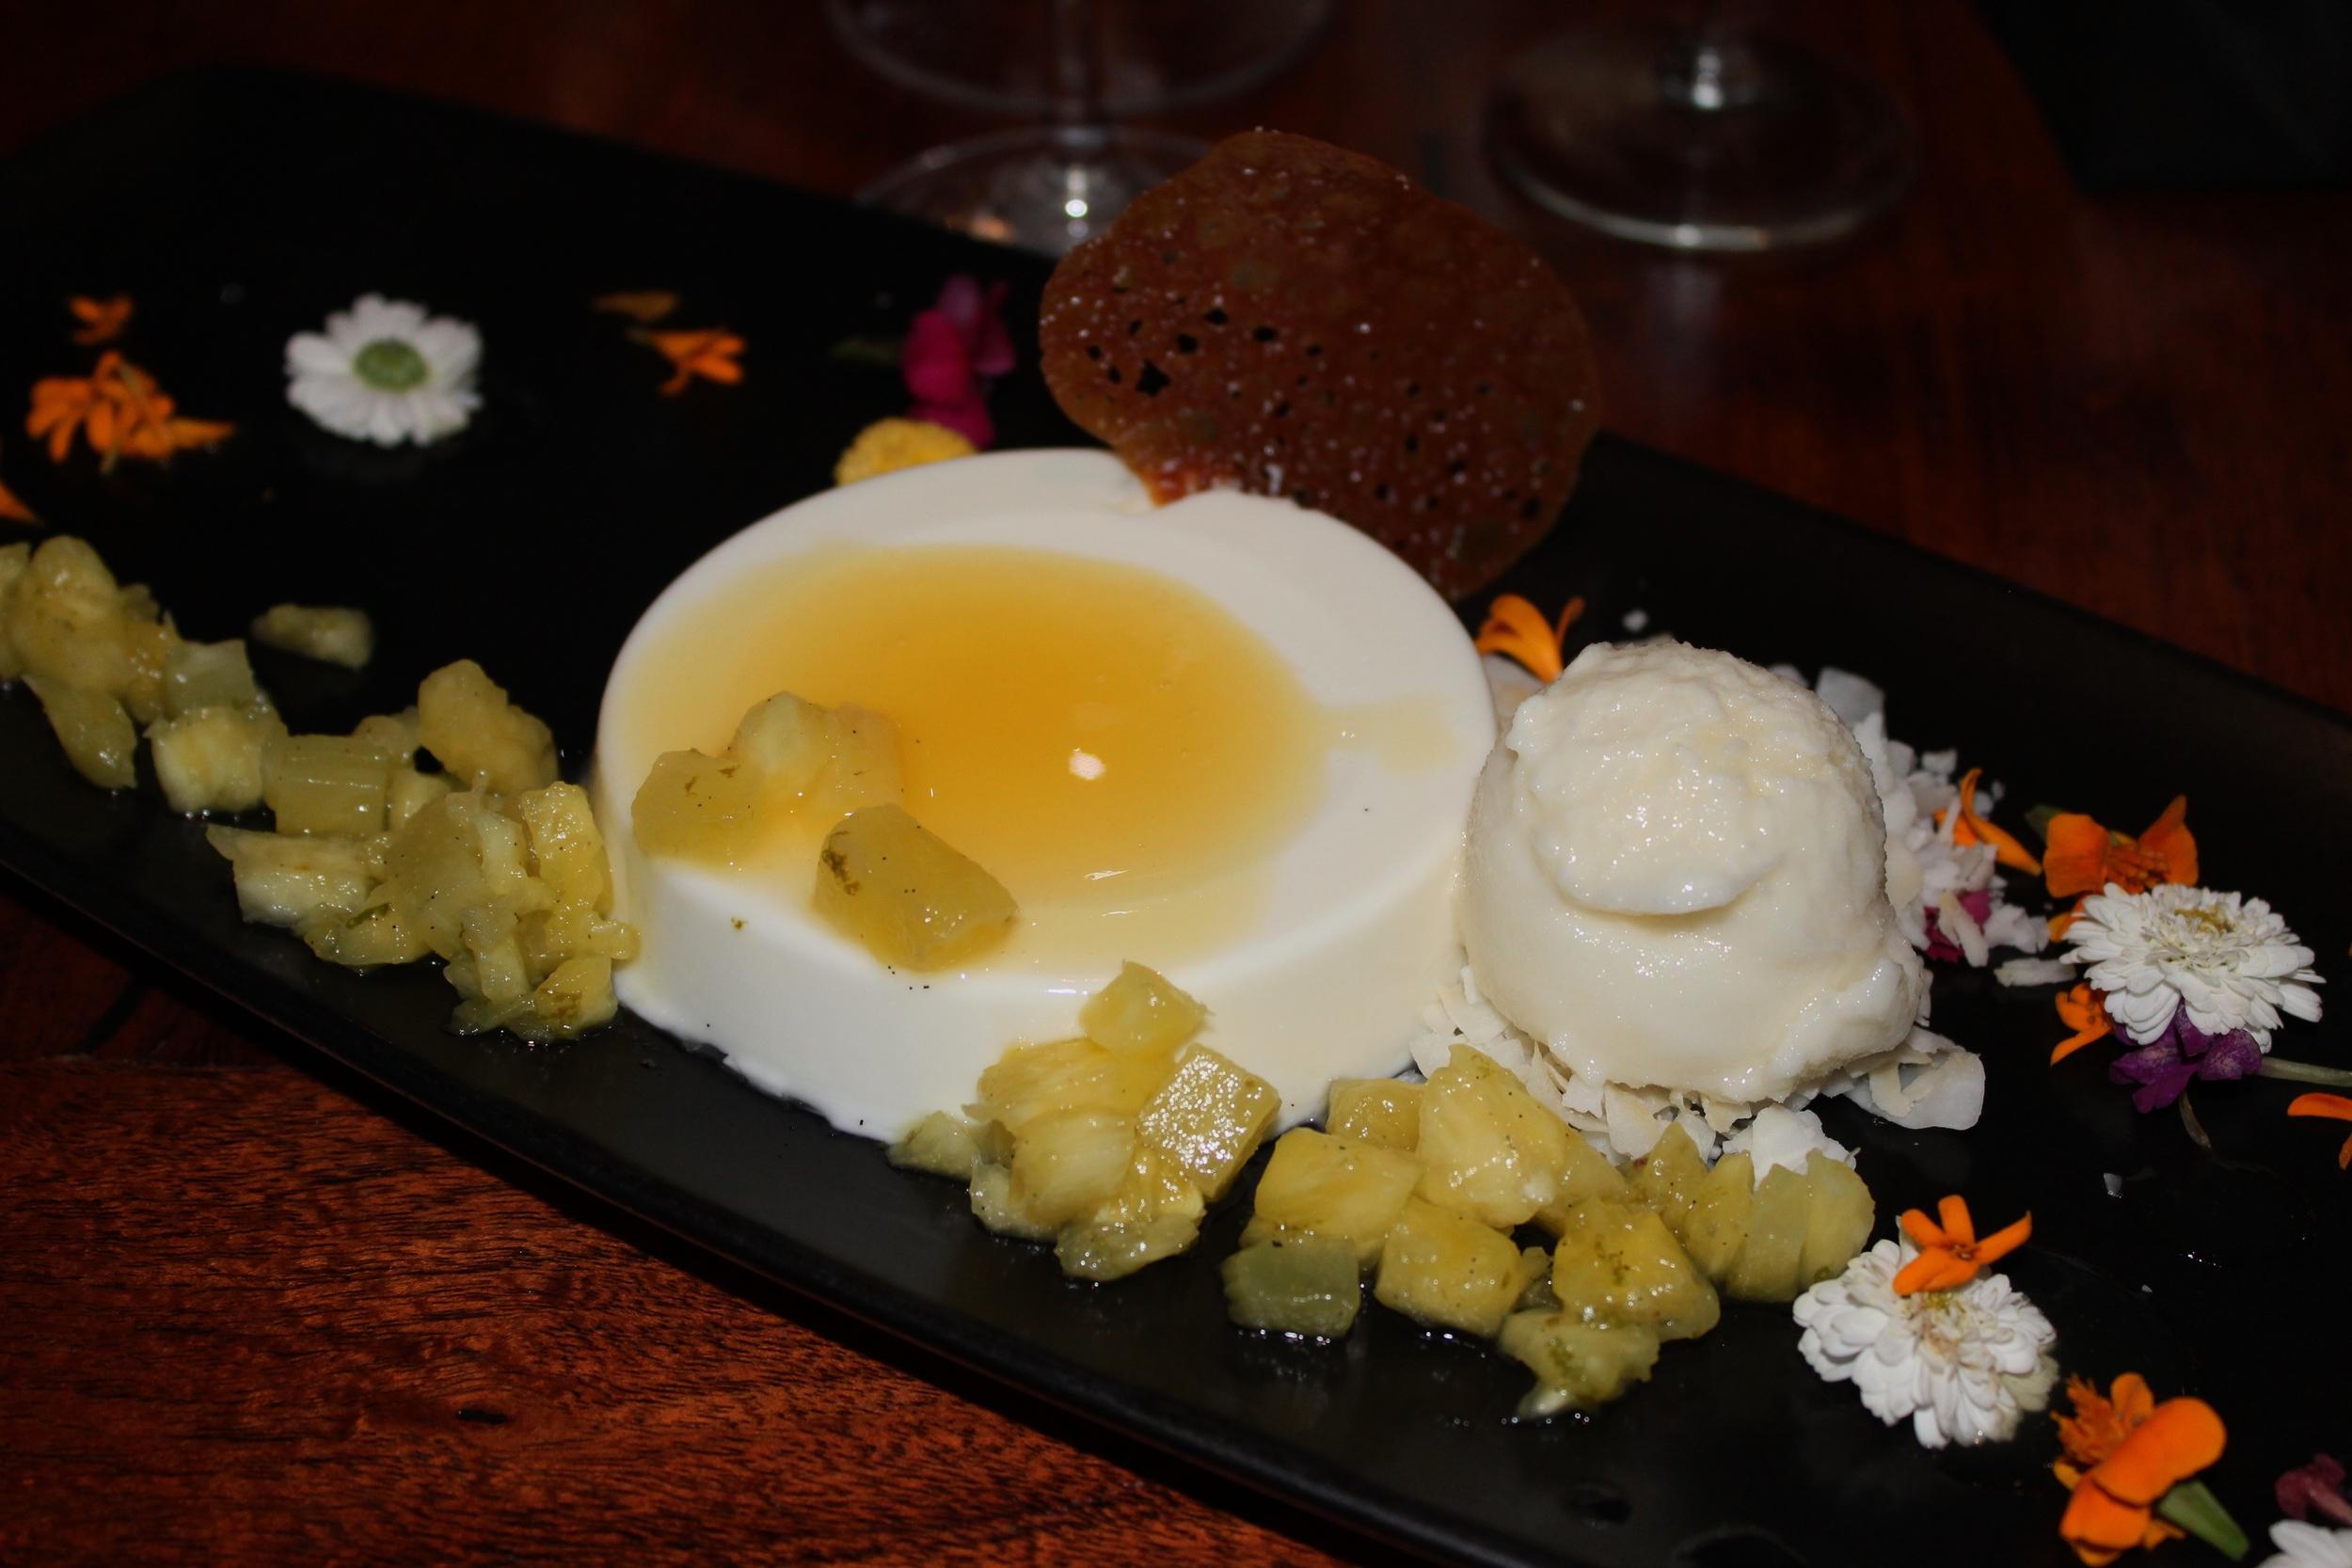 Greek Yogurt Panna Cotta with Passion Fruit Mango Tuile and Pineapple & Coconut Sorbet